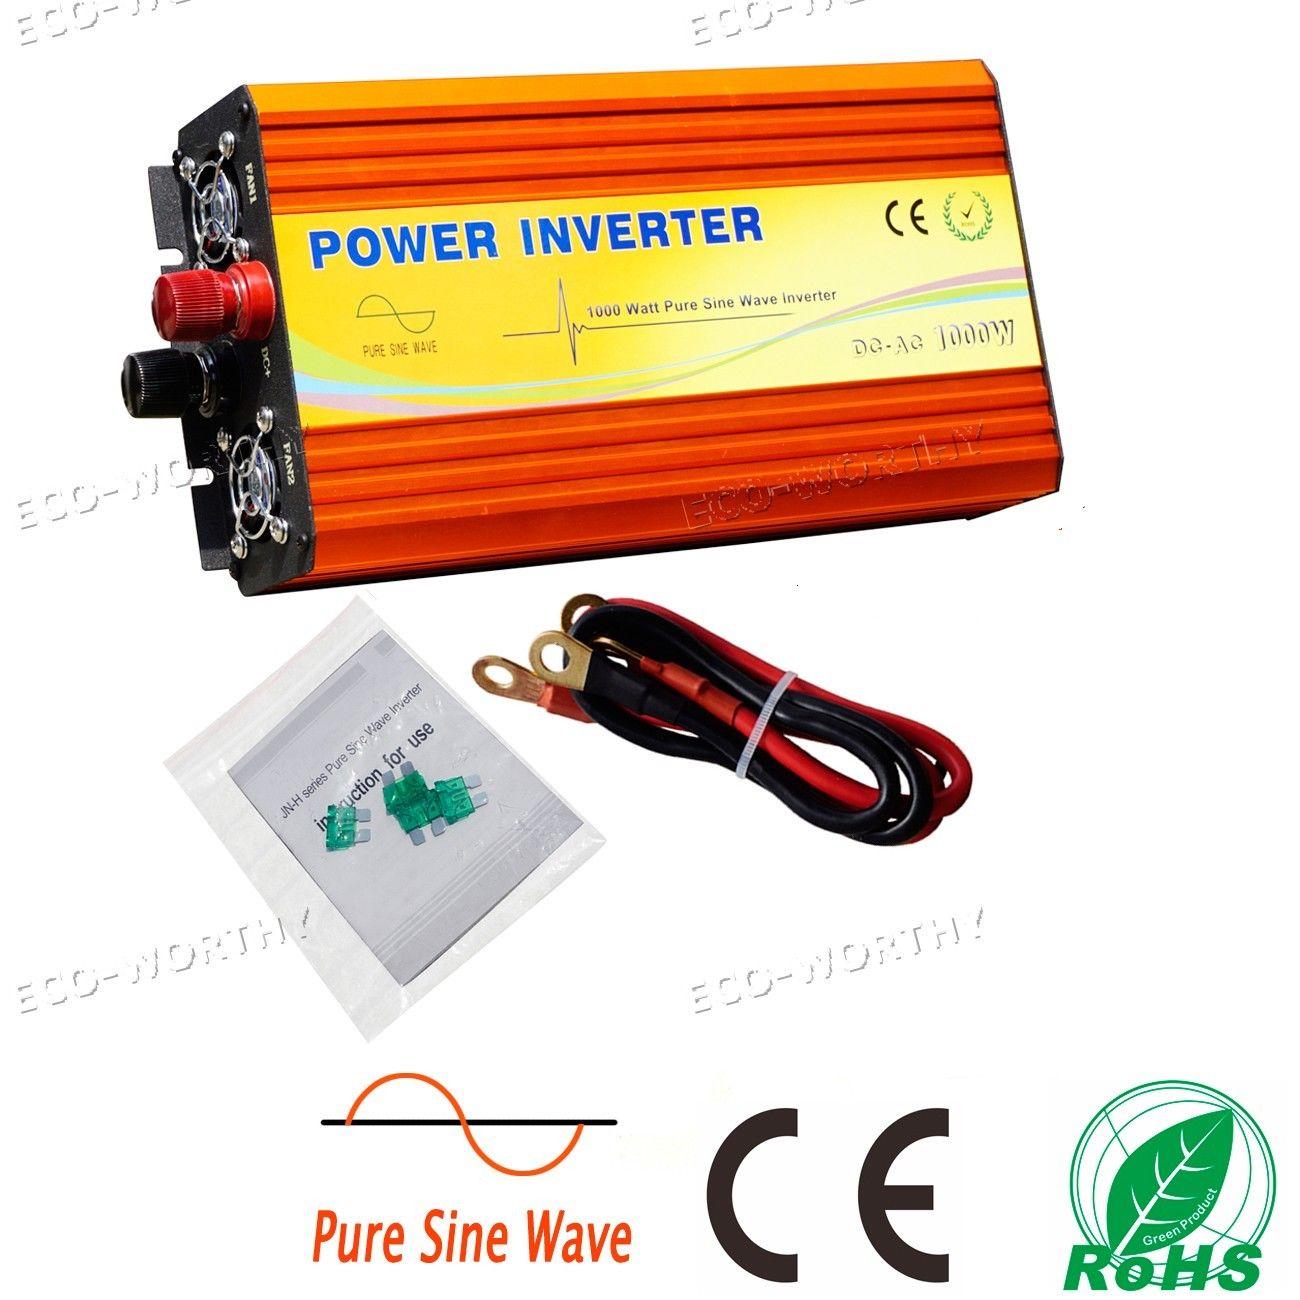 Ultra-high Performance 1KW Pure Sine Wave Off Grid Inverter 24V DC to 220V AC electrolux e 210 ultra long performance